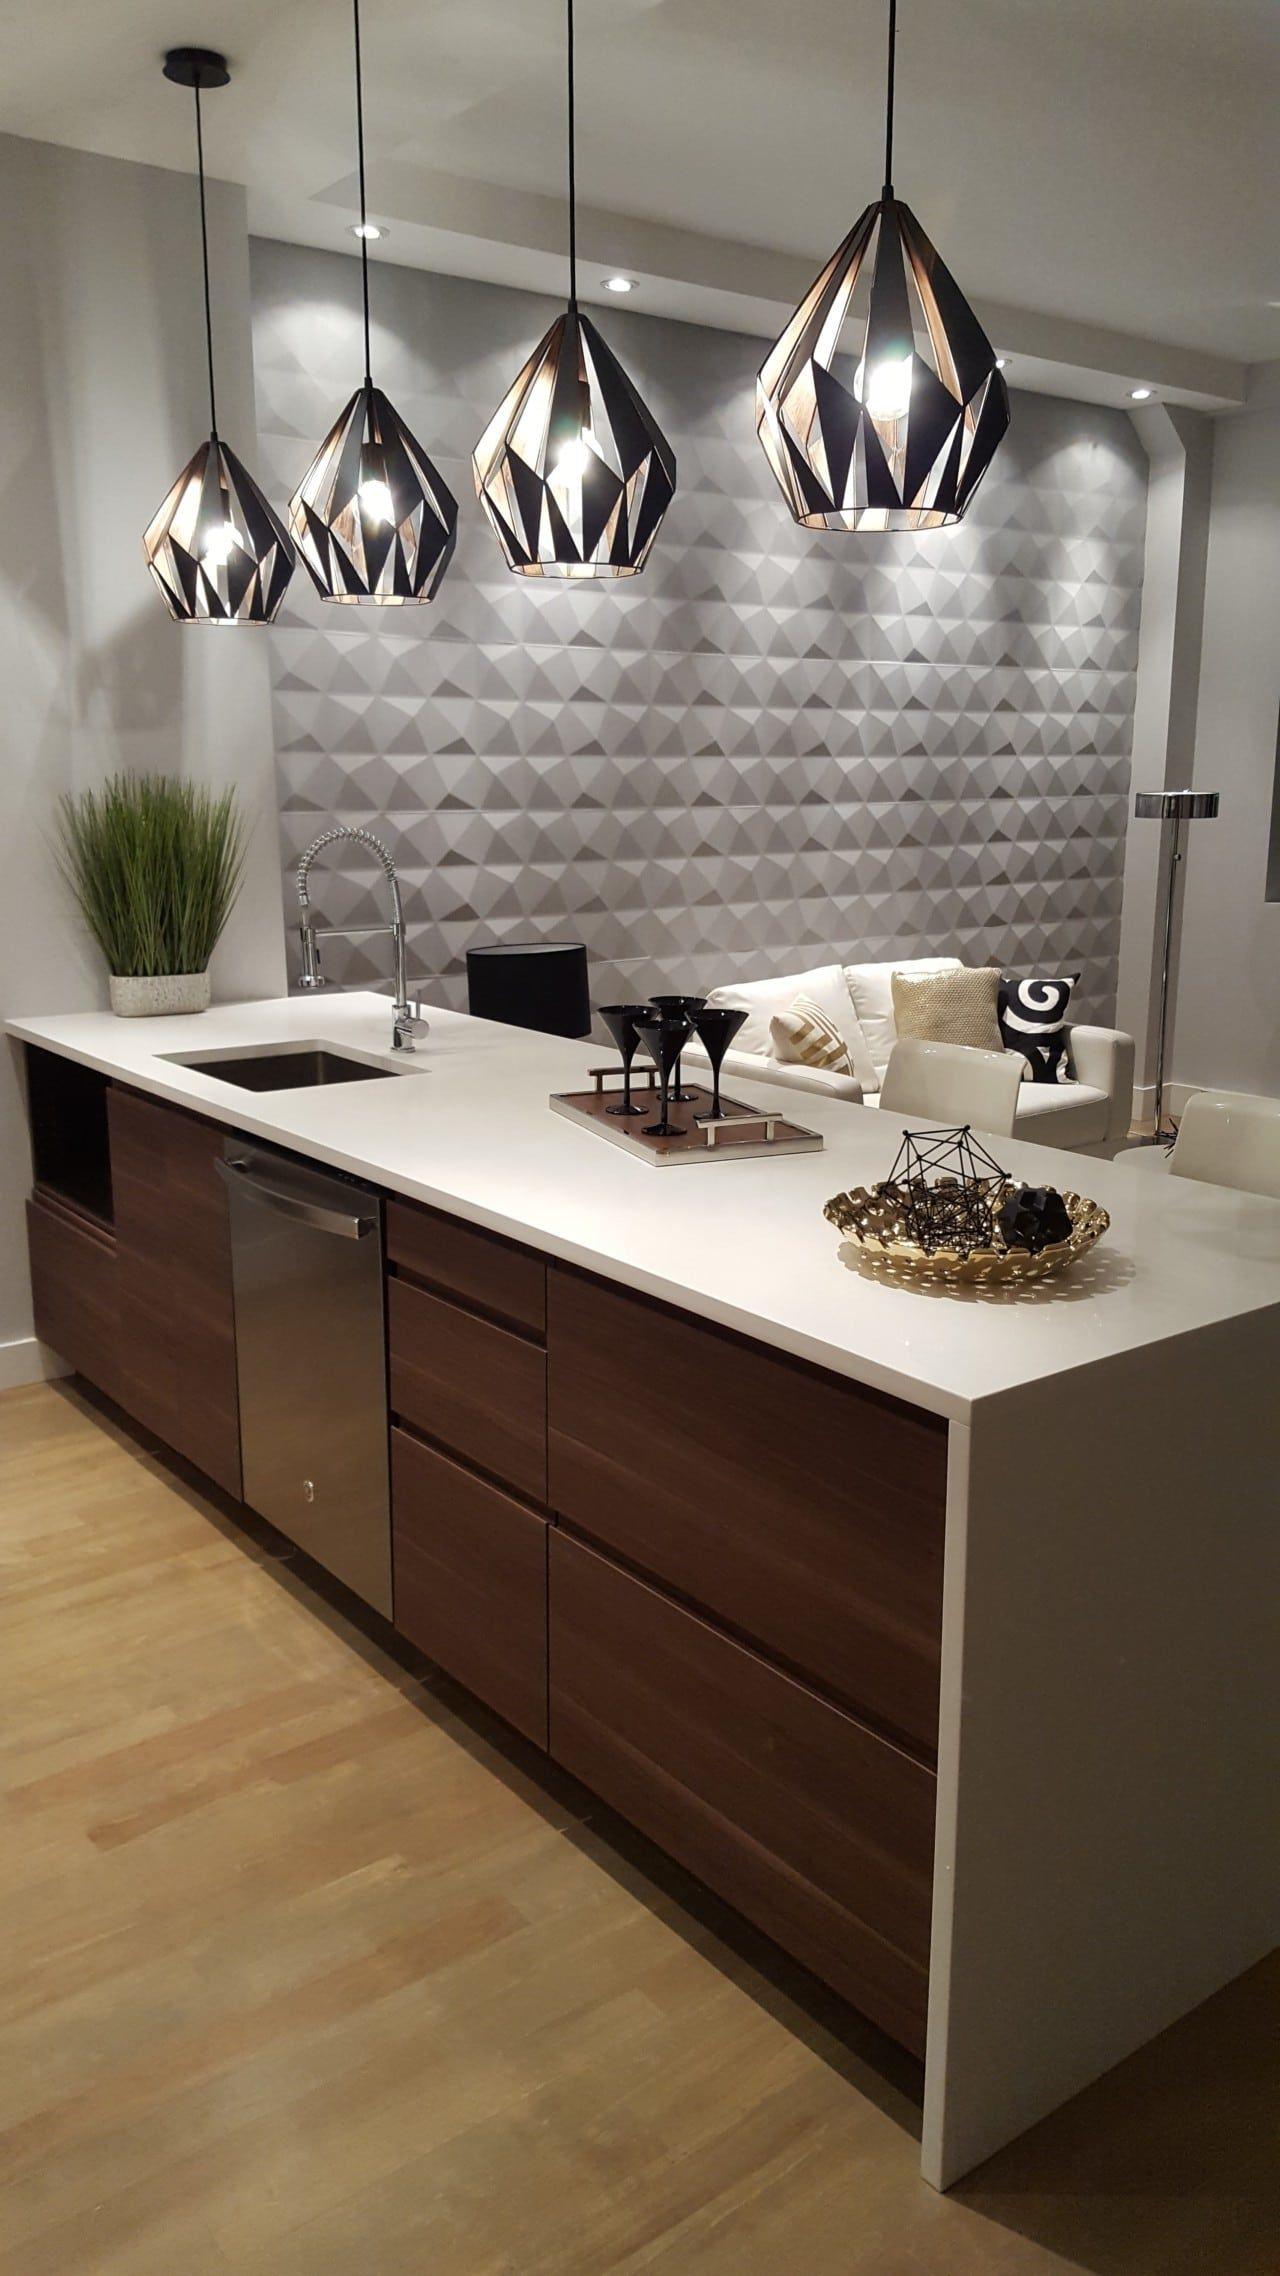 Best Decorative 3D Mdf Wood Wall Panels Lucy Design Mdf 400 x 300